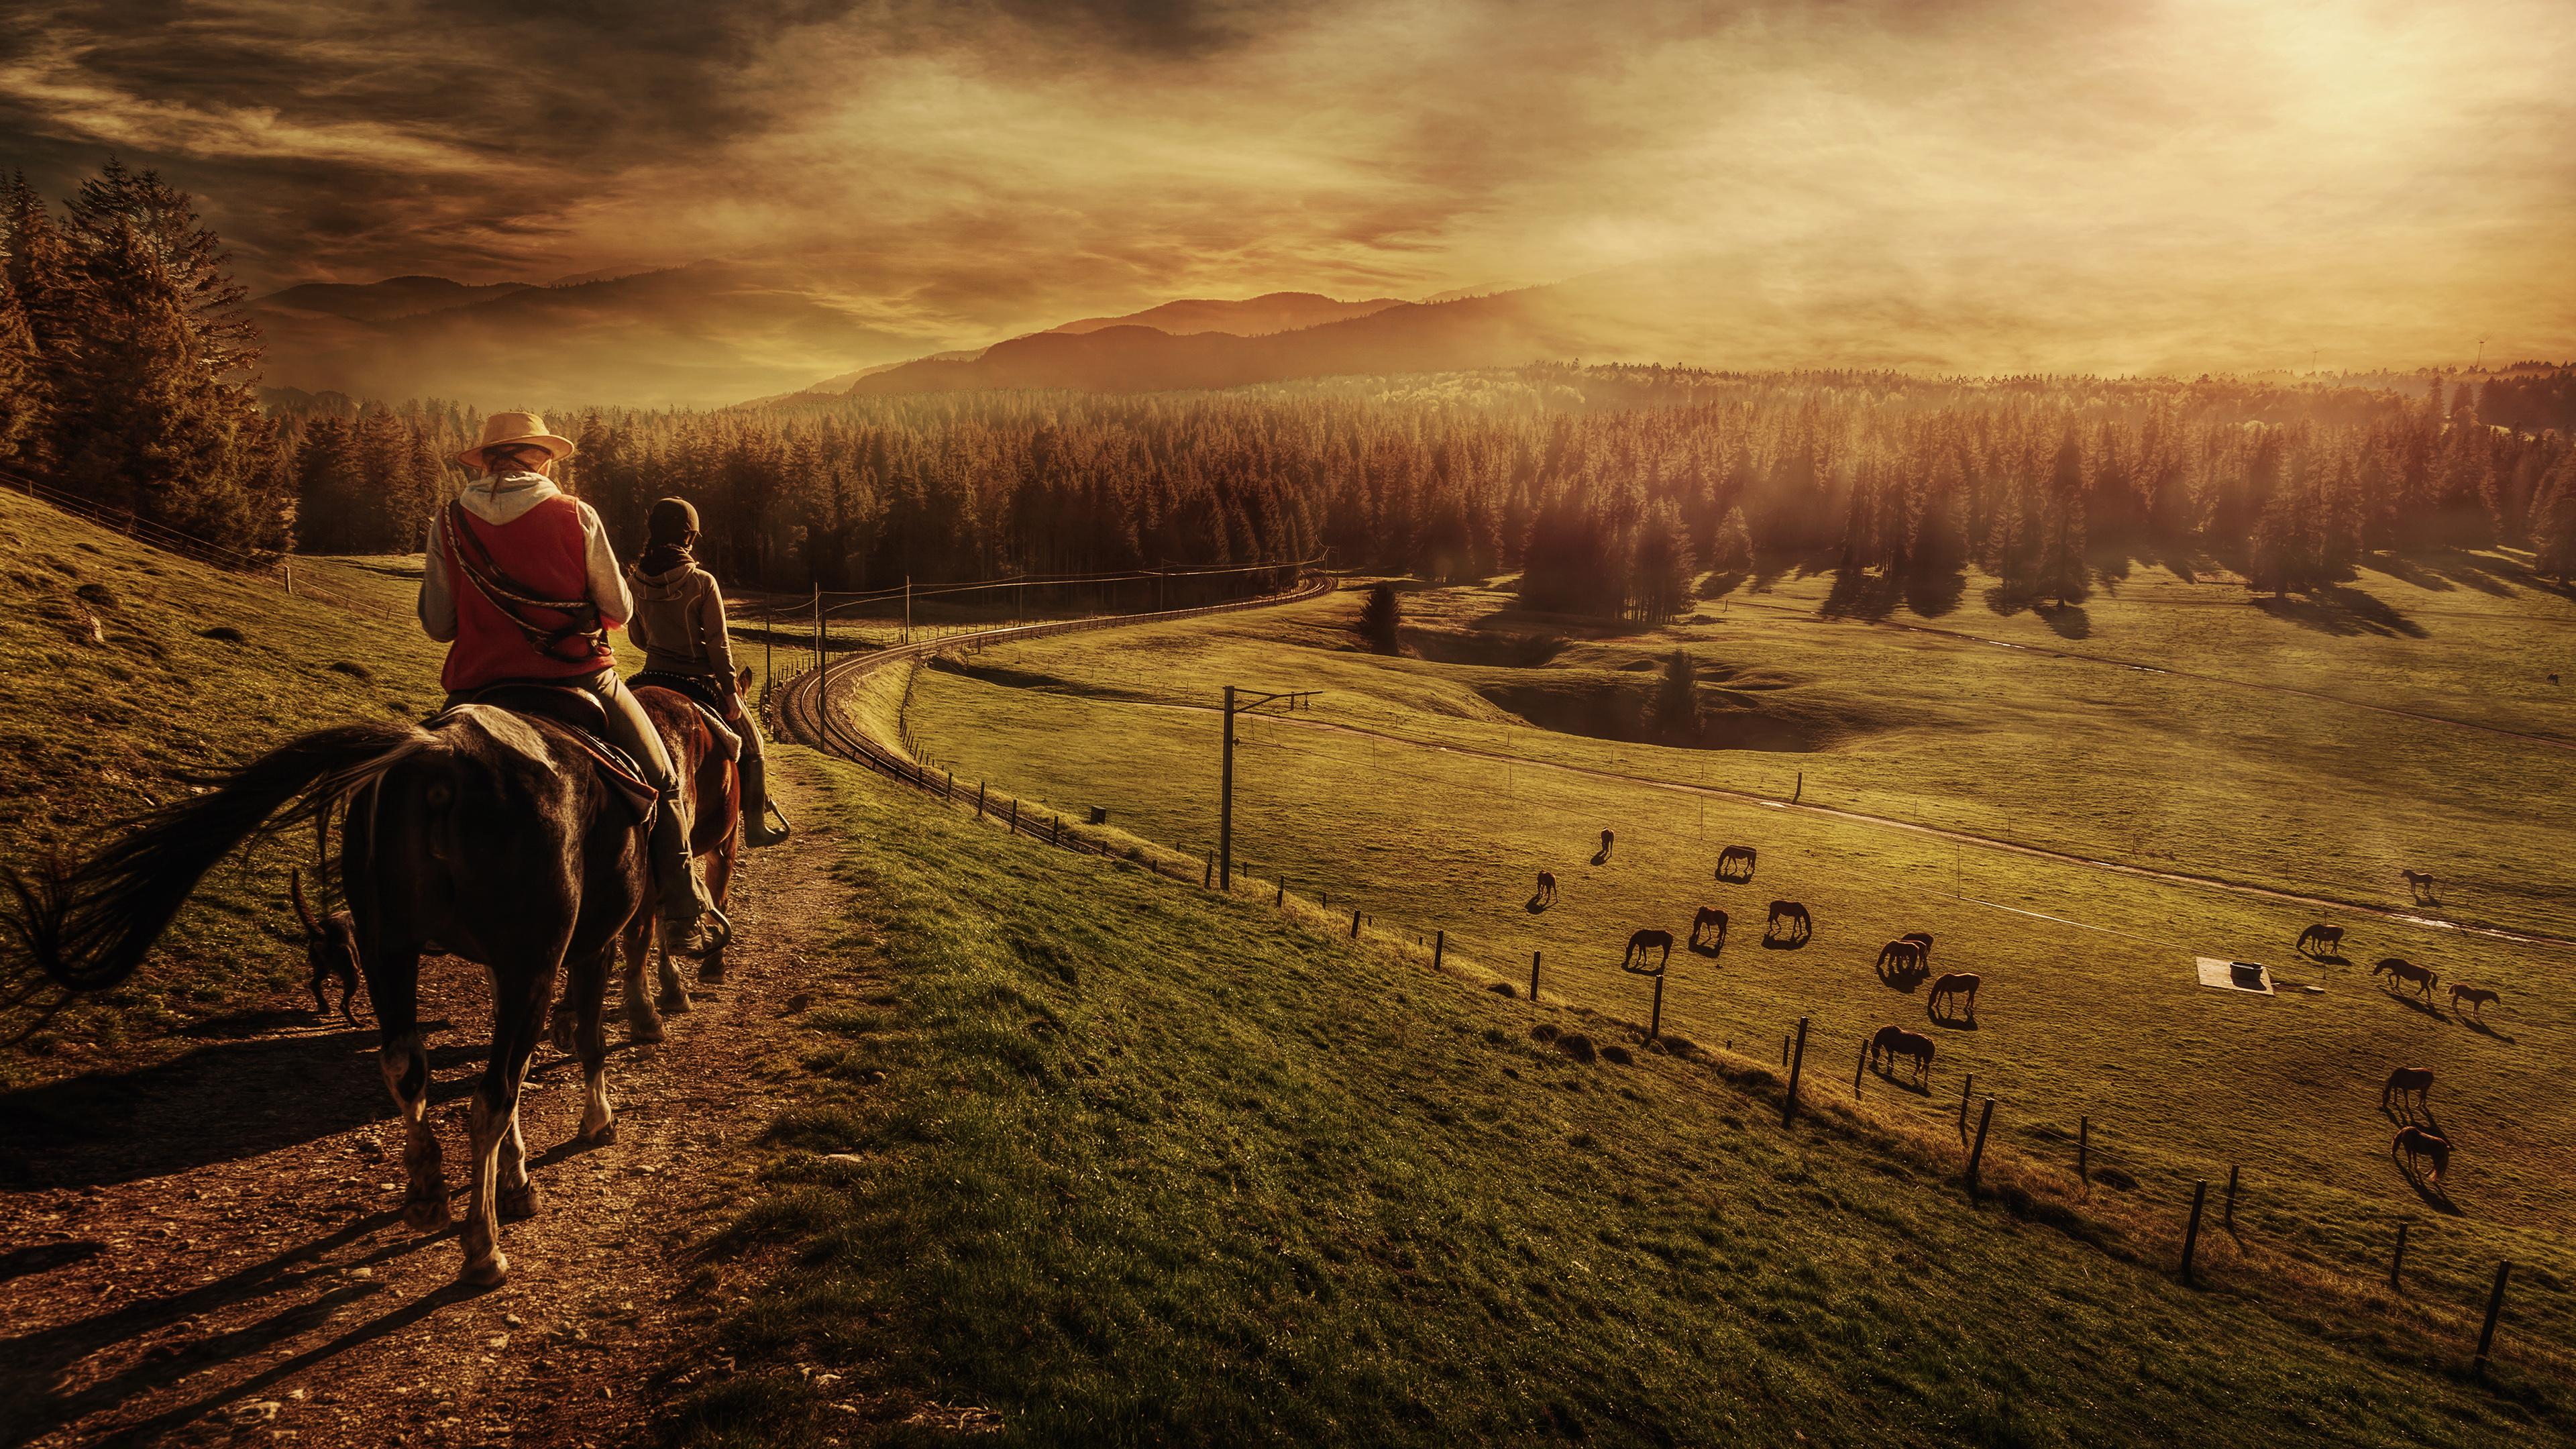 Horse Man People Sunset Landscape 3840x2160